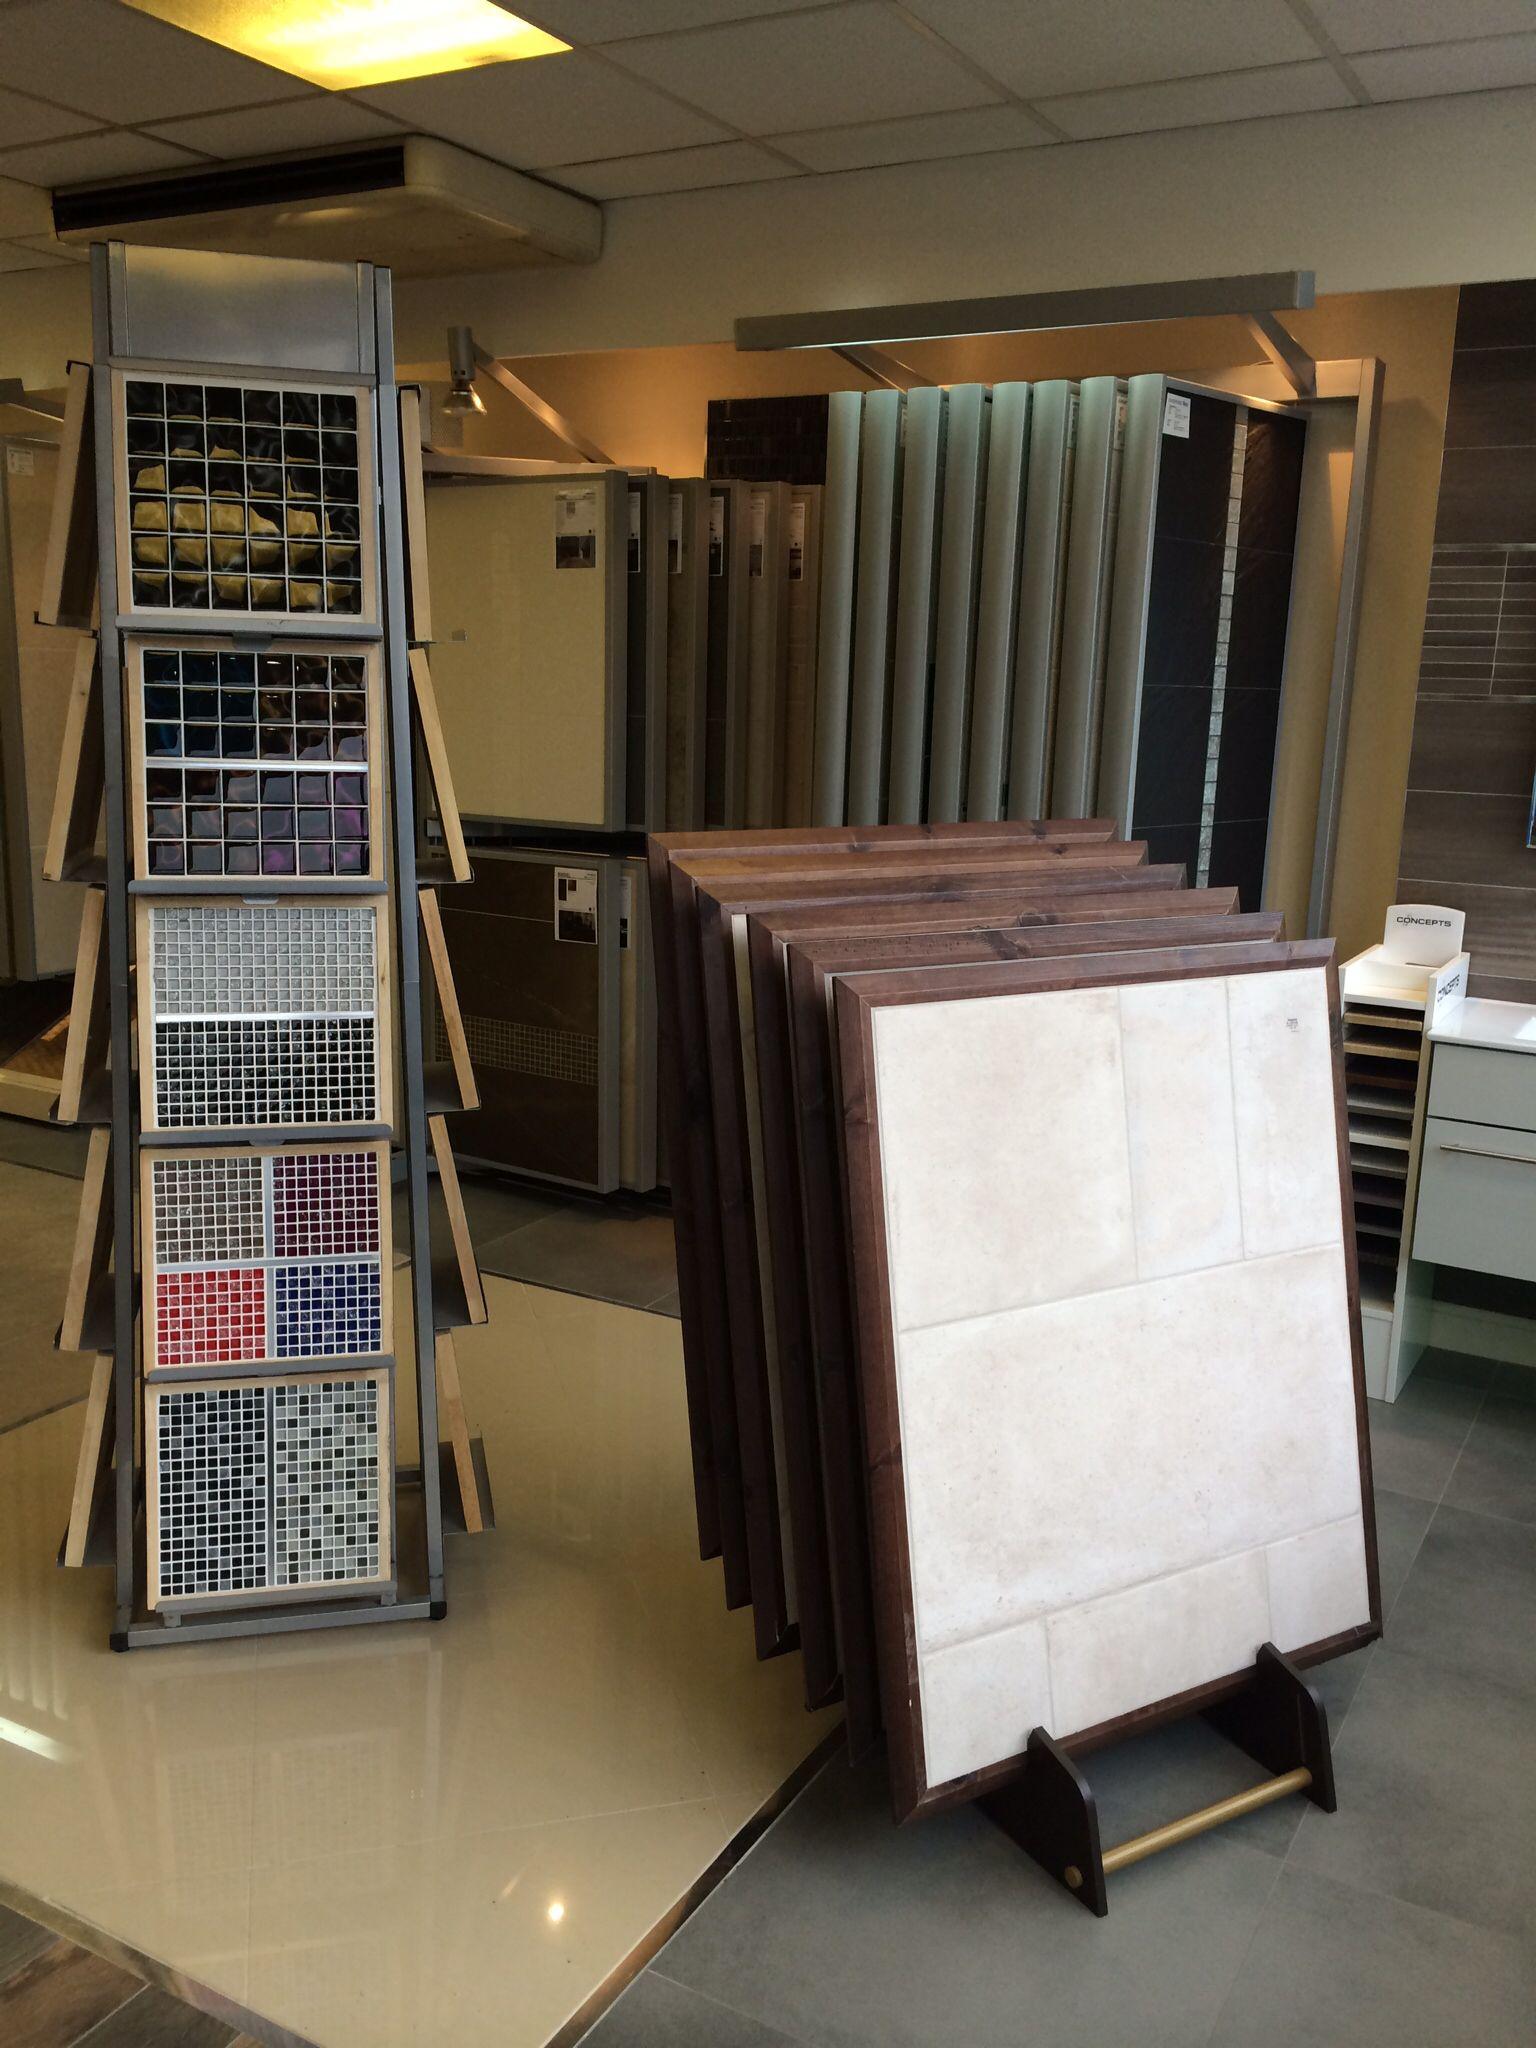 New multi size floor tiles now in stock   www.ceramicatilesashtead.com  #personalbydesign